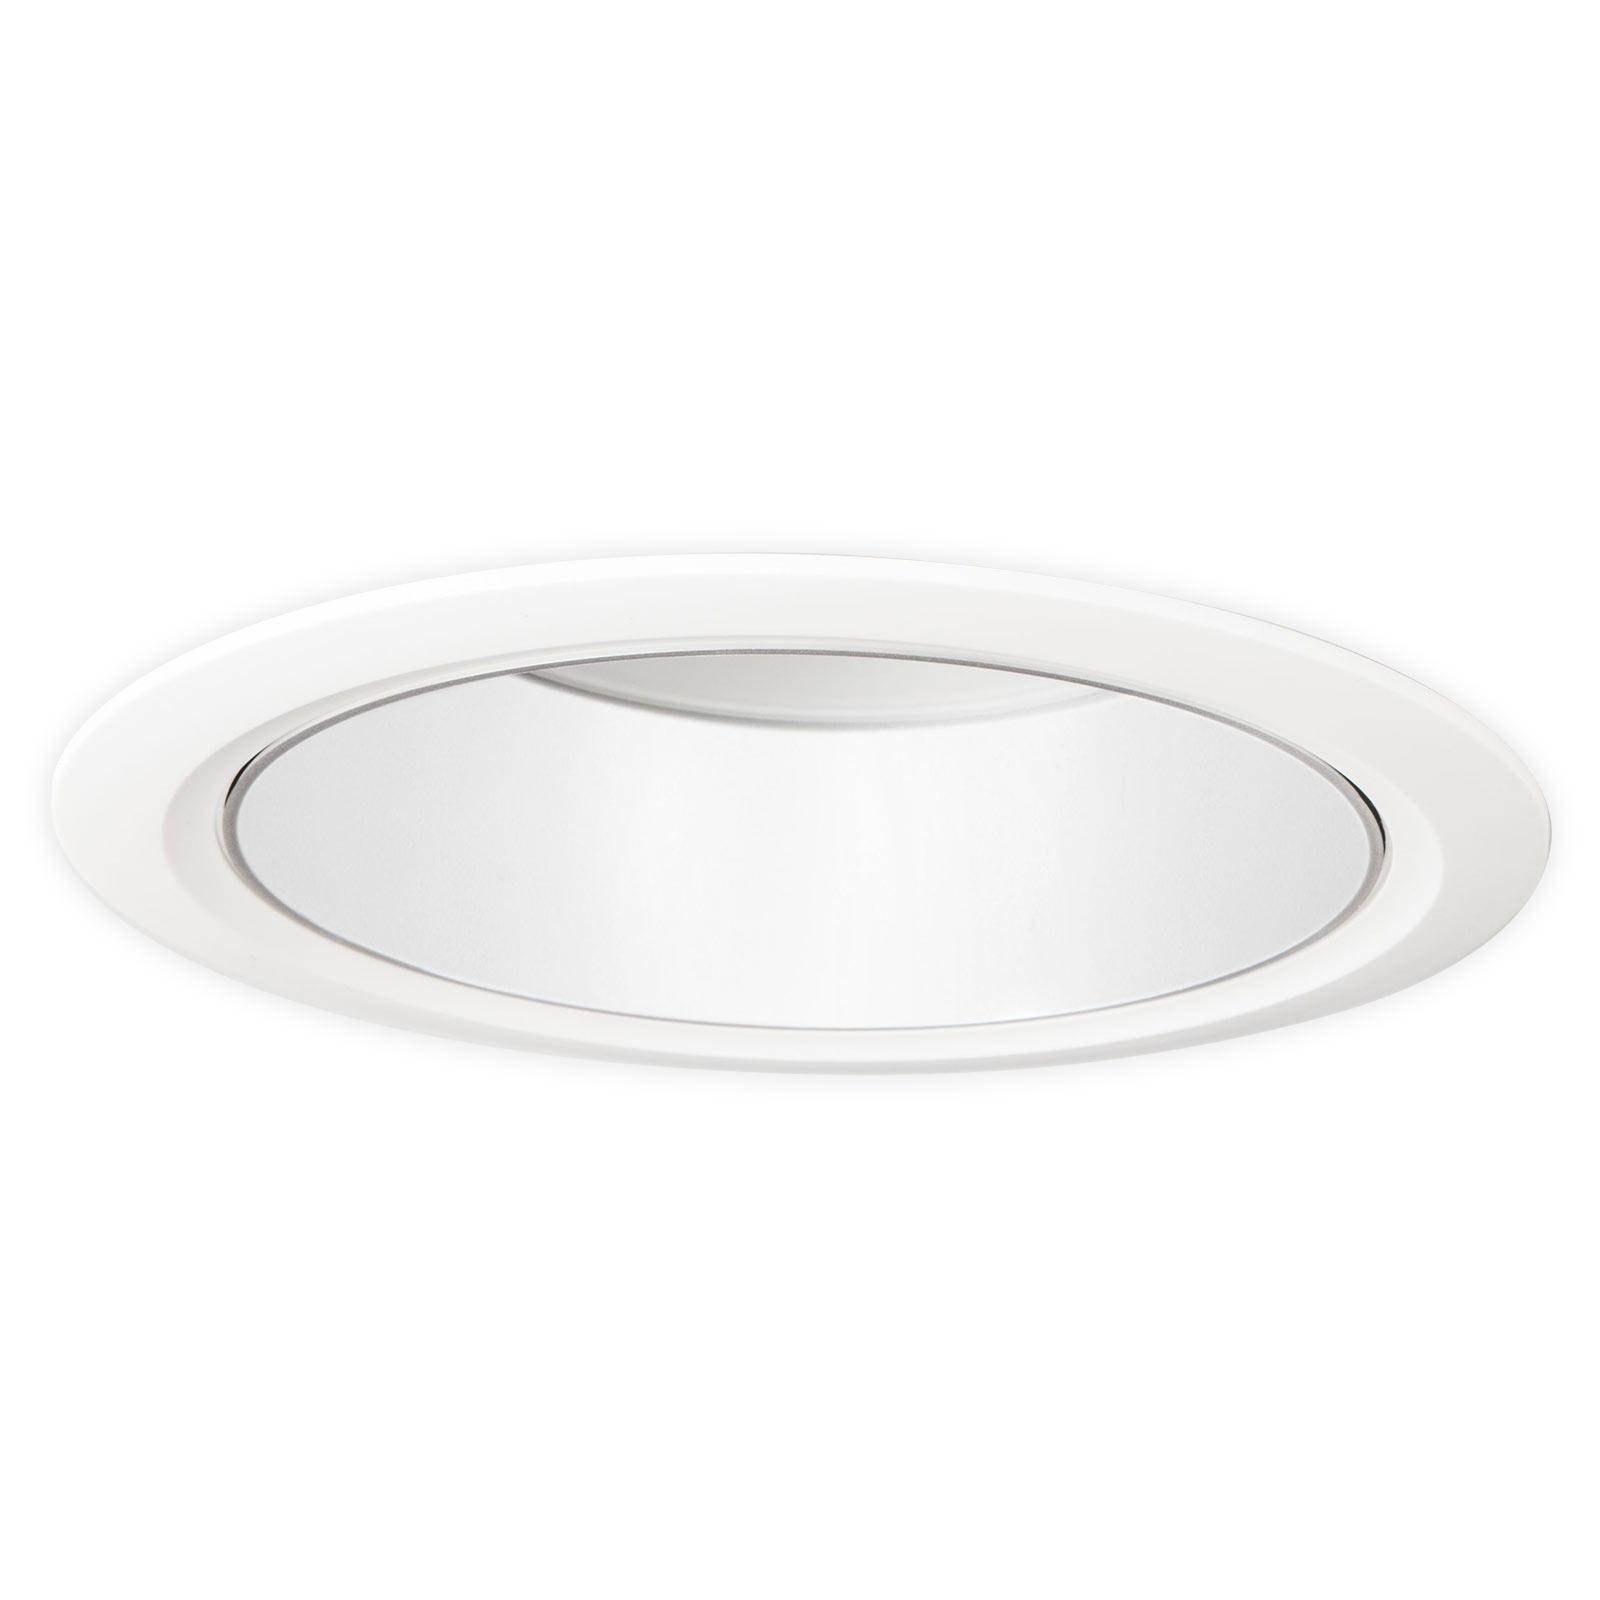 D70-RF155 HF LED-downlight 4 000 K hvit/hvit